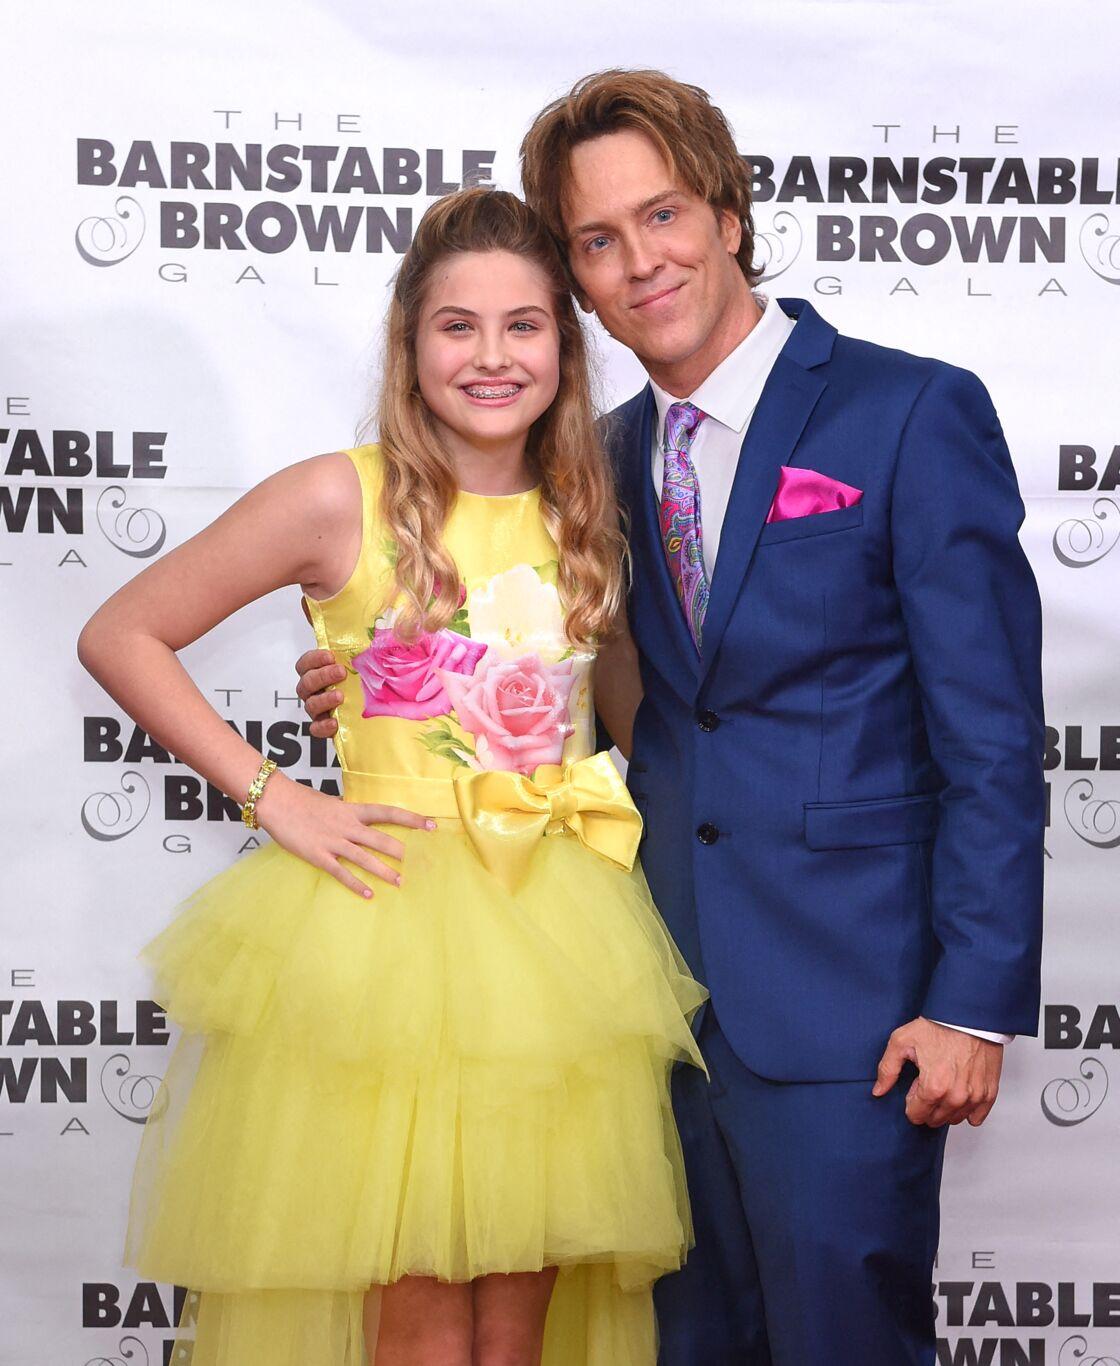 Dannielynn Birkhead et son père Larry Birkhead en mai 2019, à Louisville